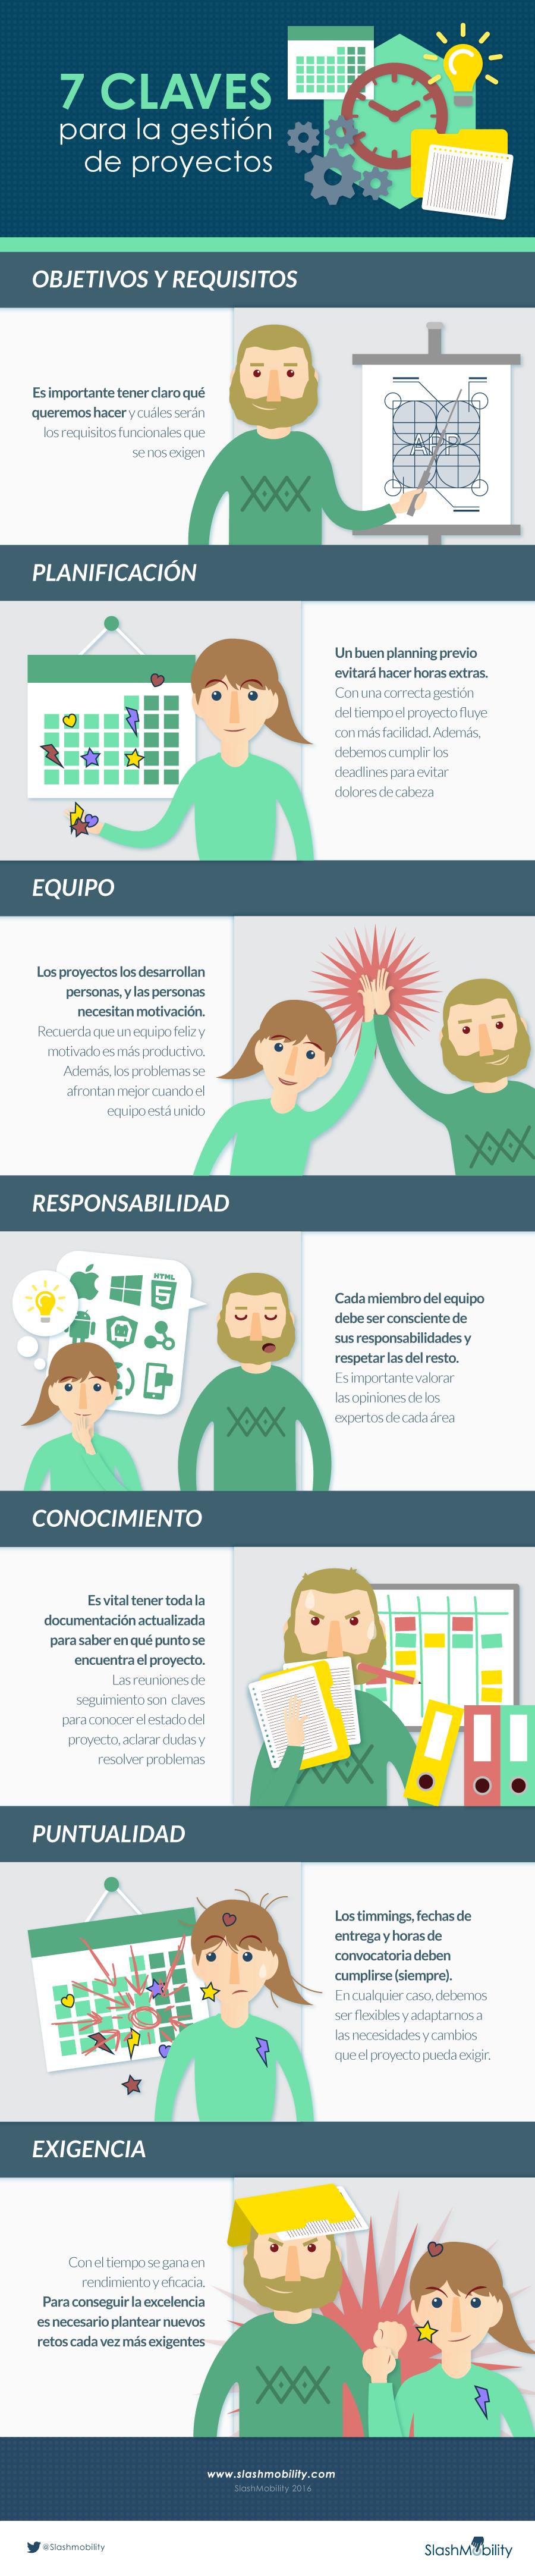 infografia gestion proyectos